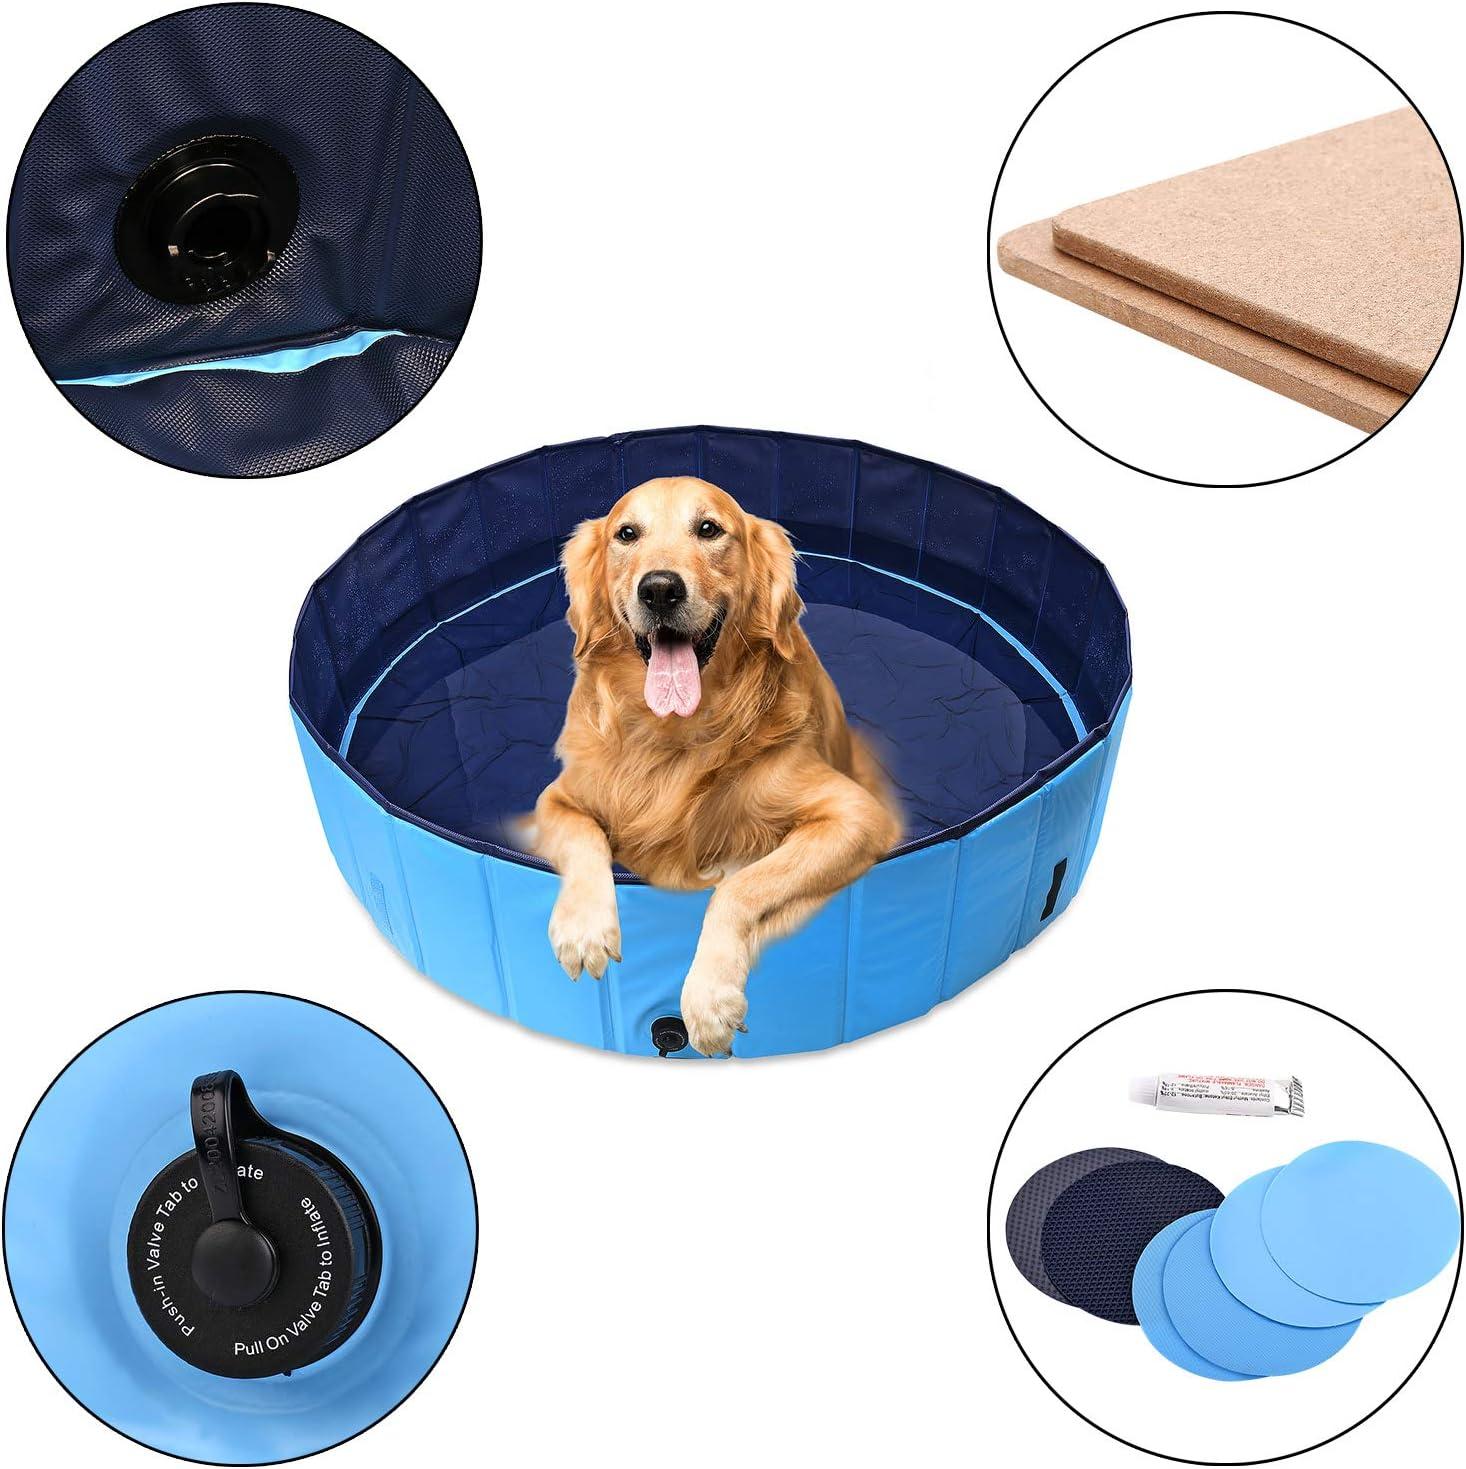 Folding Dog // Cat Bath 120 /× 30cm Foldable Pet Dogs Swimming Pool Puppy Bathing Tub Blue Dia 47 Cats Paddling Doggy Dog 47D x 12H 120cm